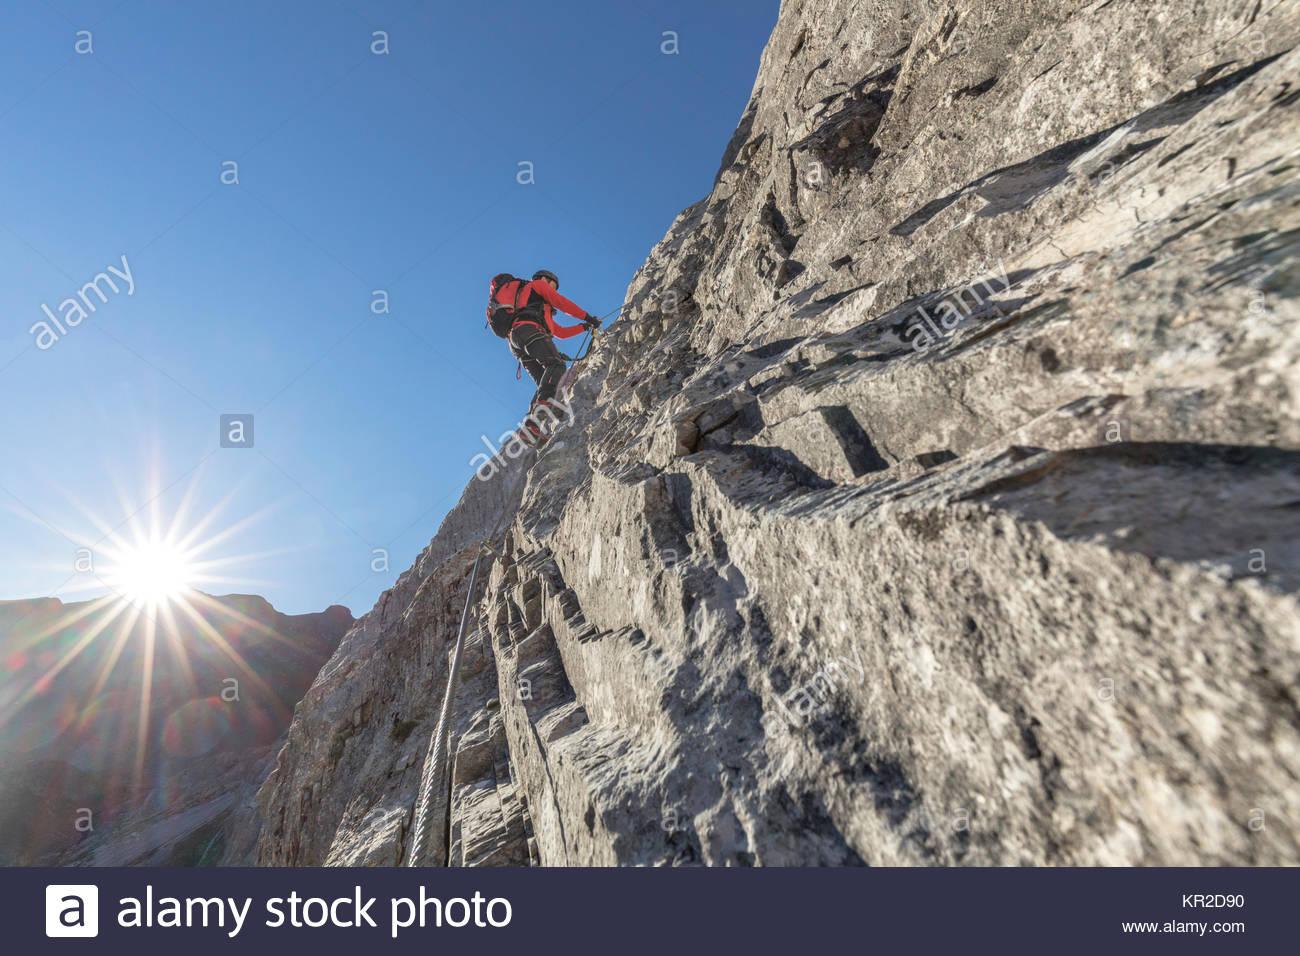 Mountaineer along the via ferrata on the north side of mount Gr. Kinigat, Kartitsch, East Tyrol, Austria, Europe - Stock Image